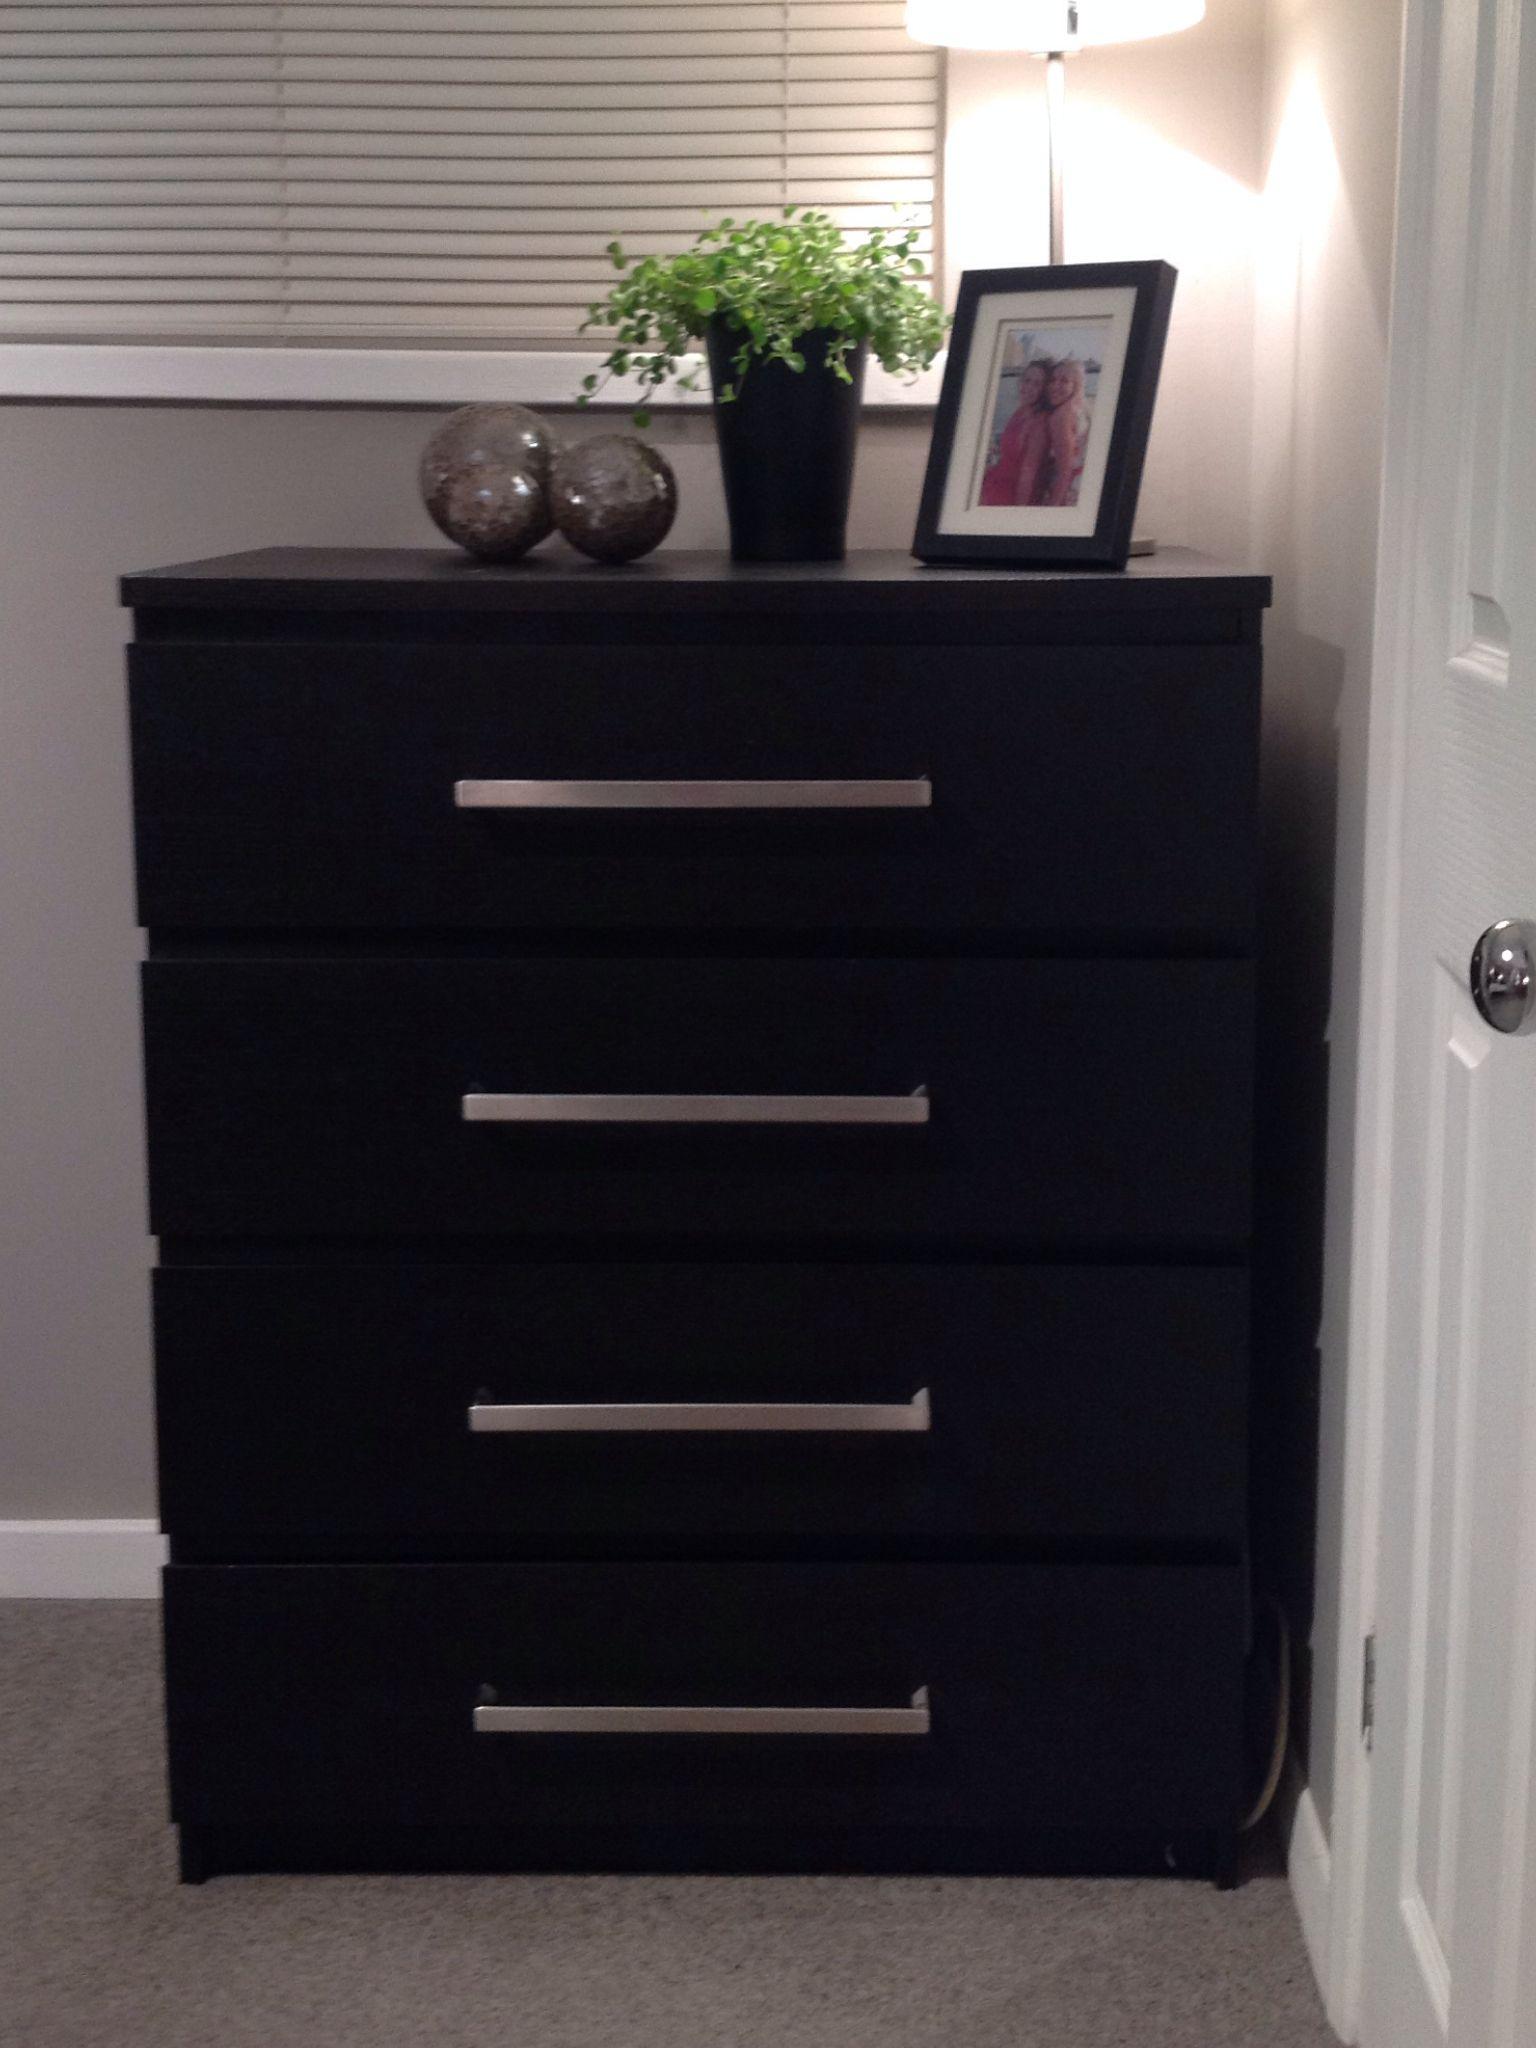 Ikea Malm chest of drawers with ikea Tyda handles | Hacks ...